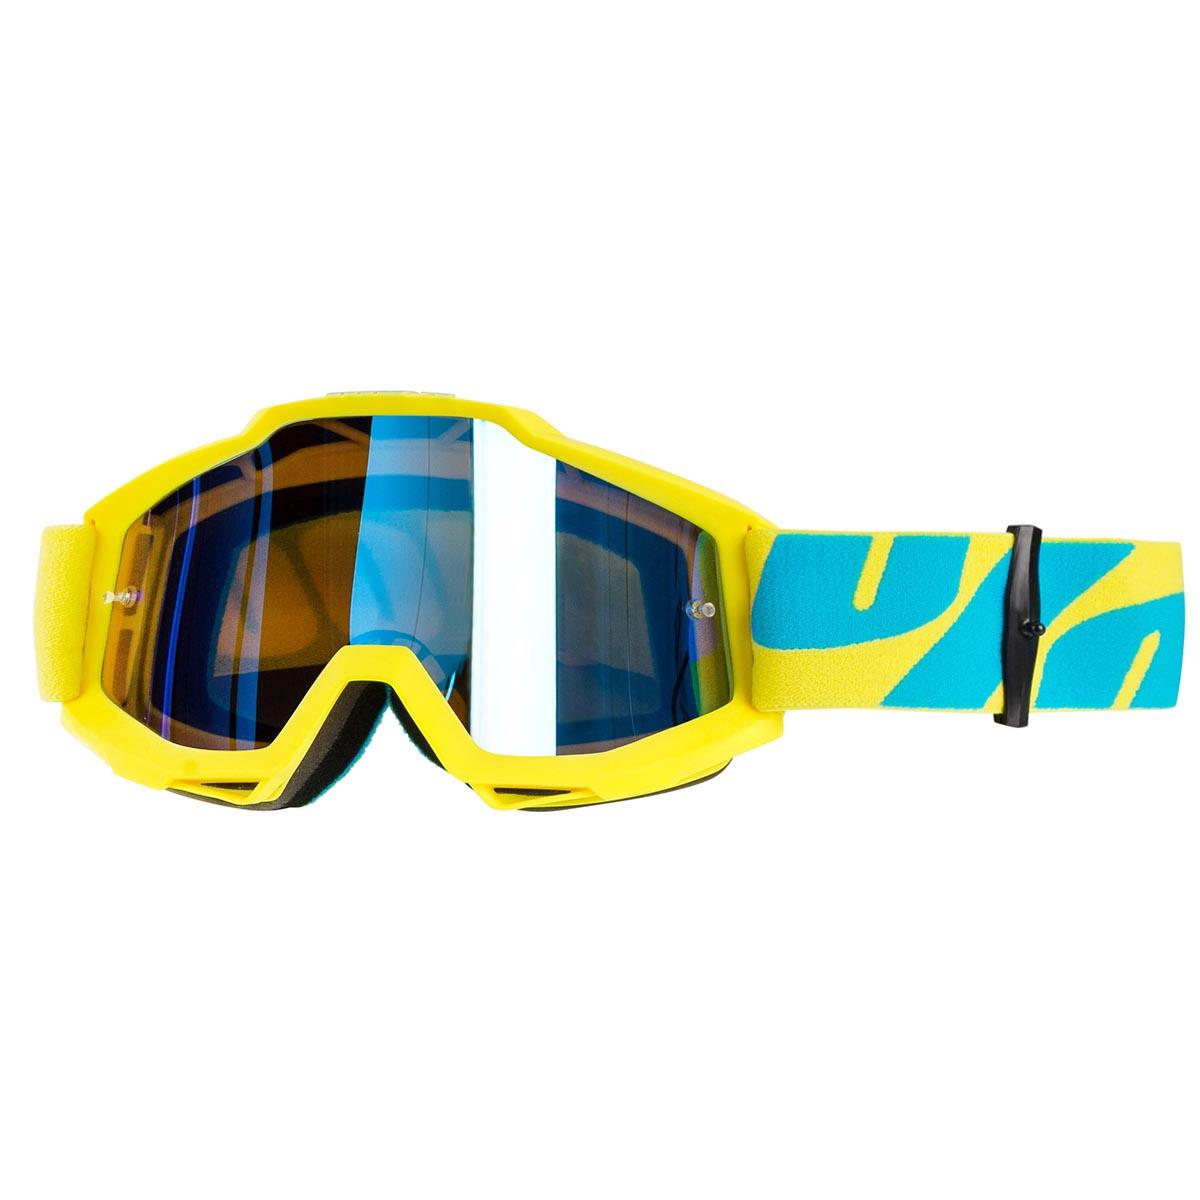 100% Crossbrille The Accuri Fiji - Blau verspiegelt Anti-Fog